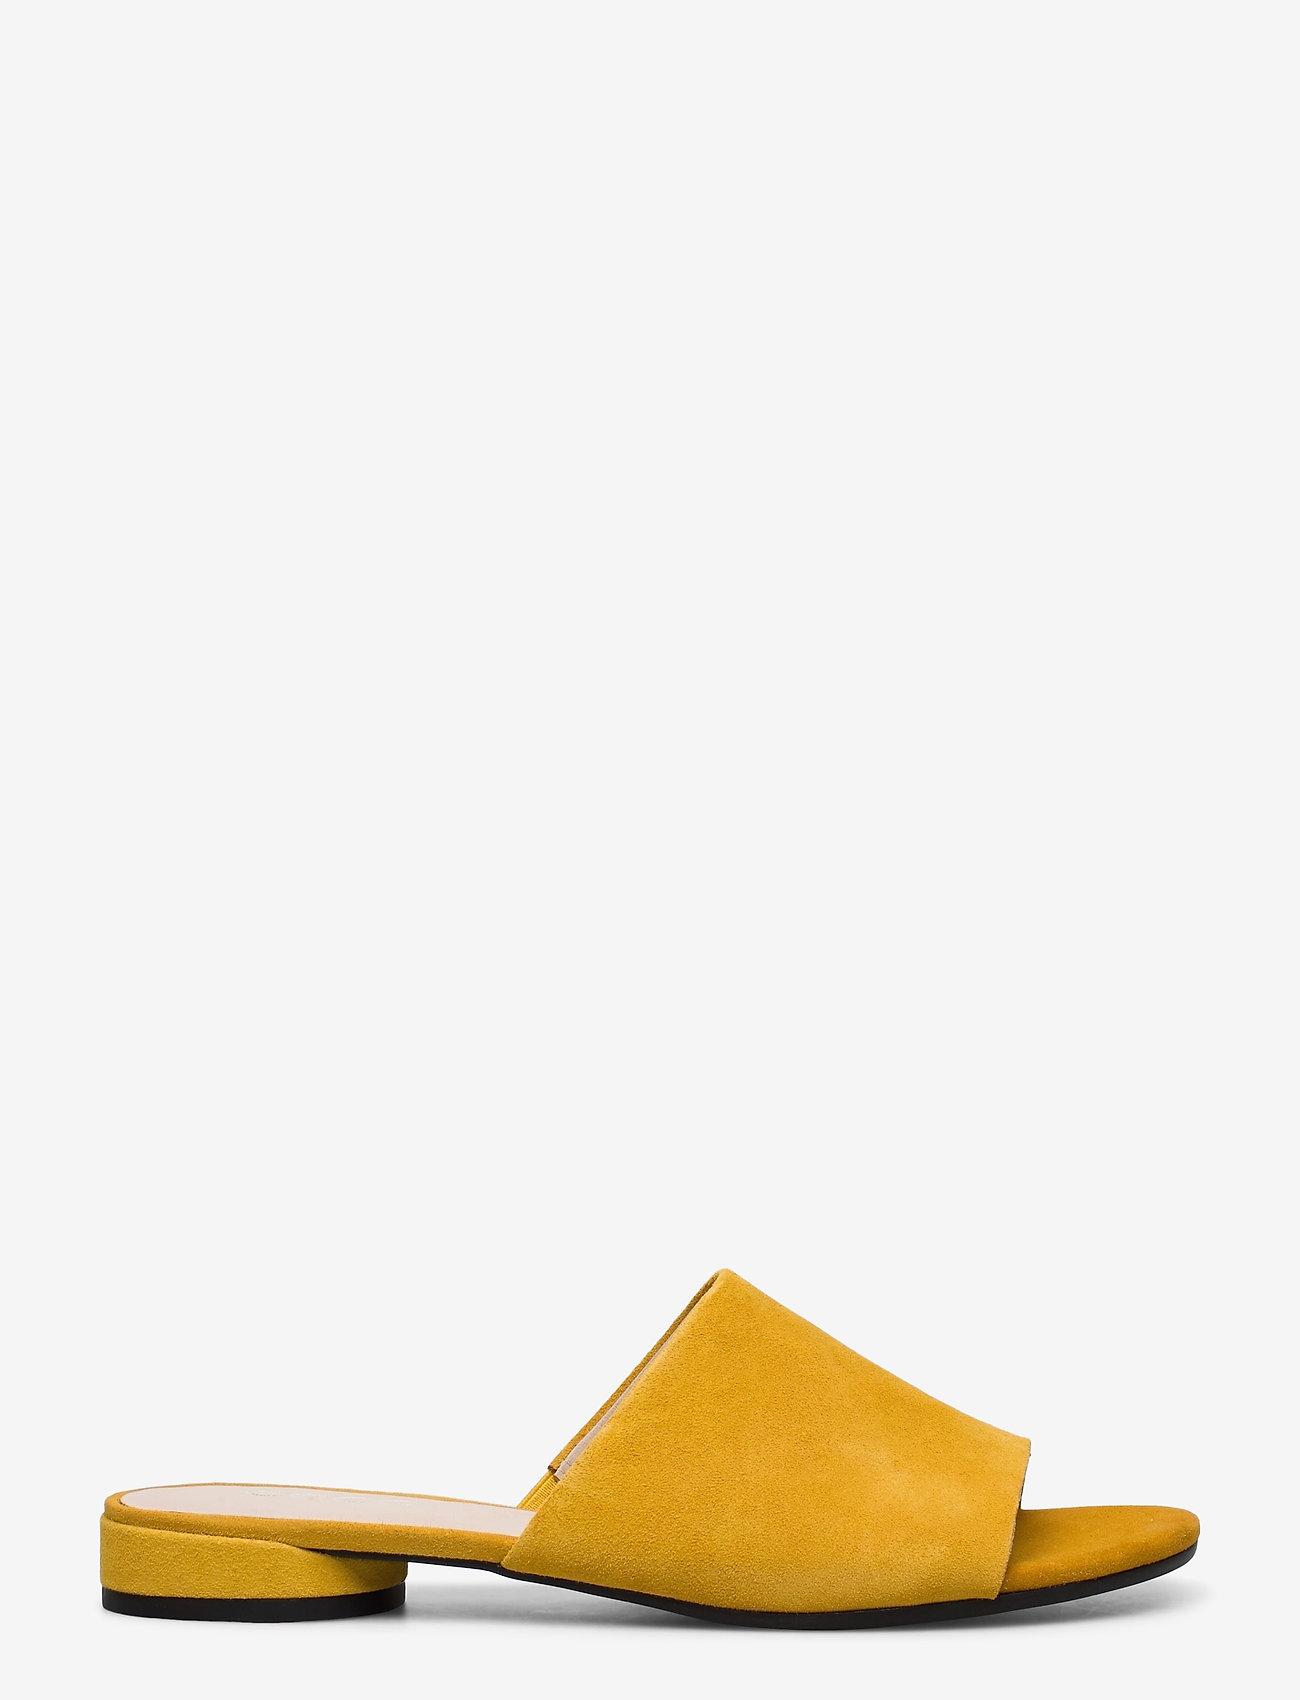 ECCO - W FLAT SANDAL II - flat sandals - merigold - 1